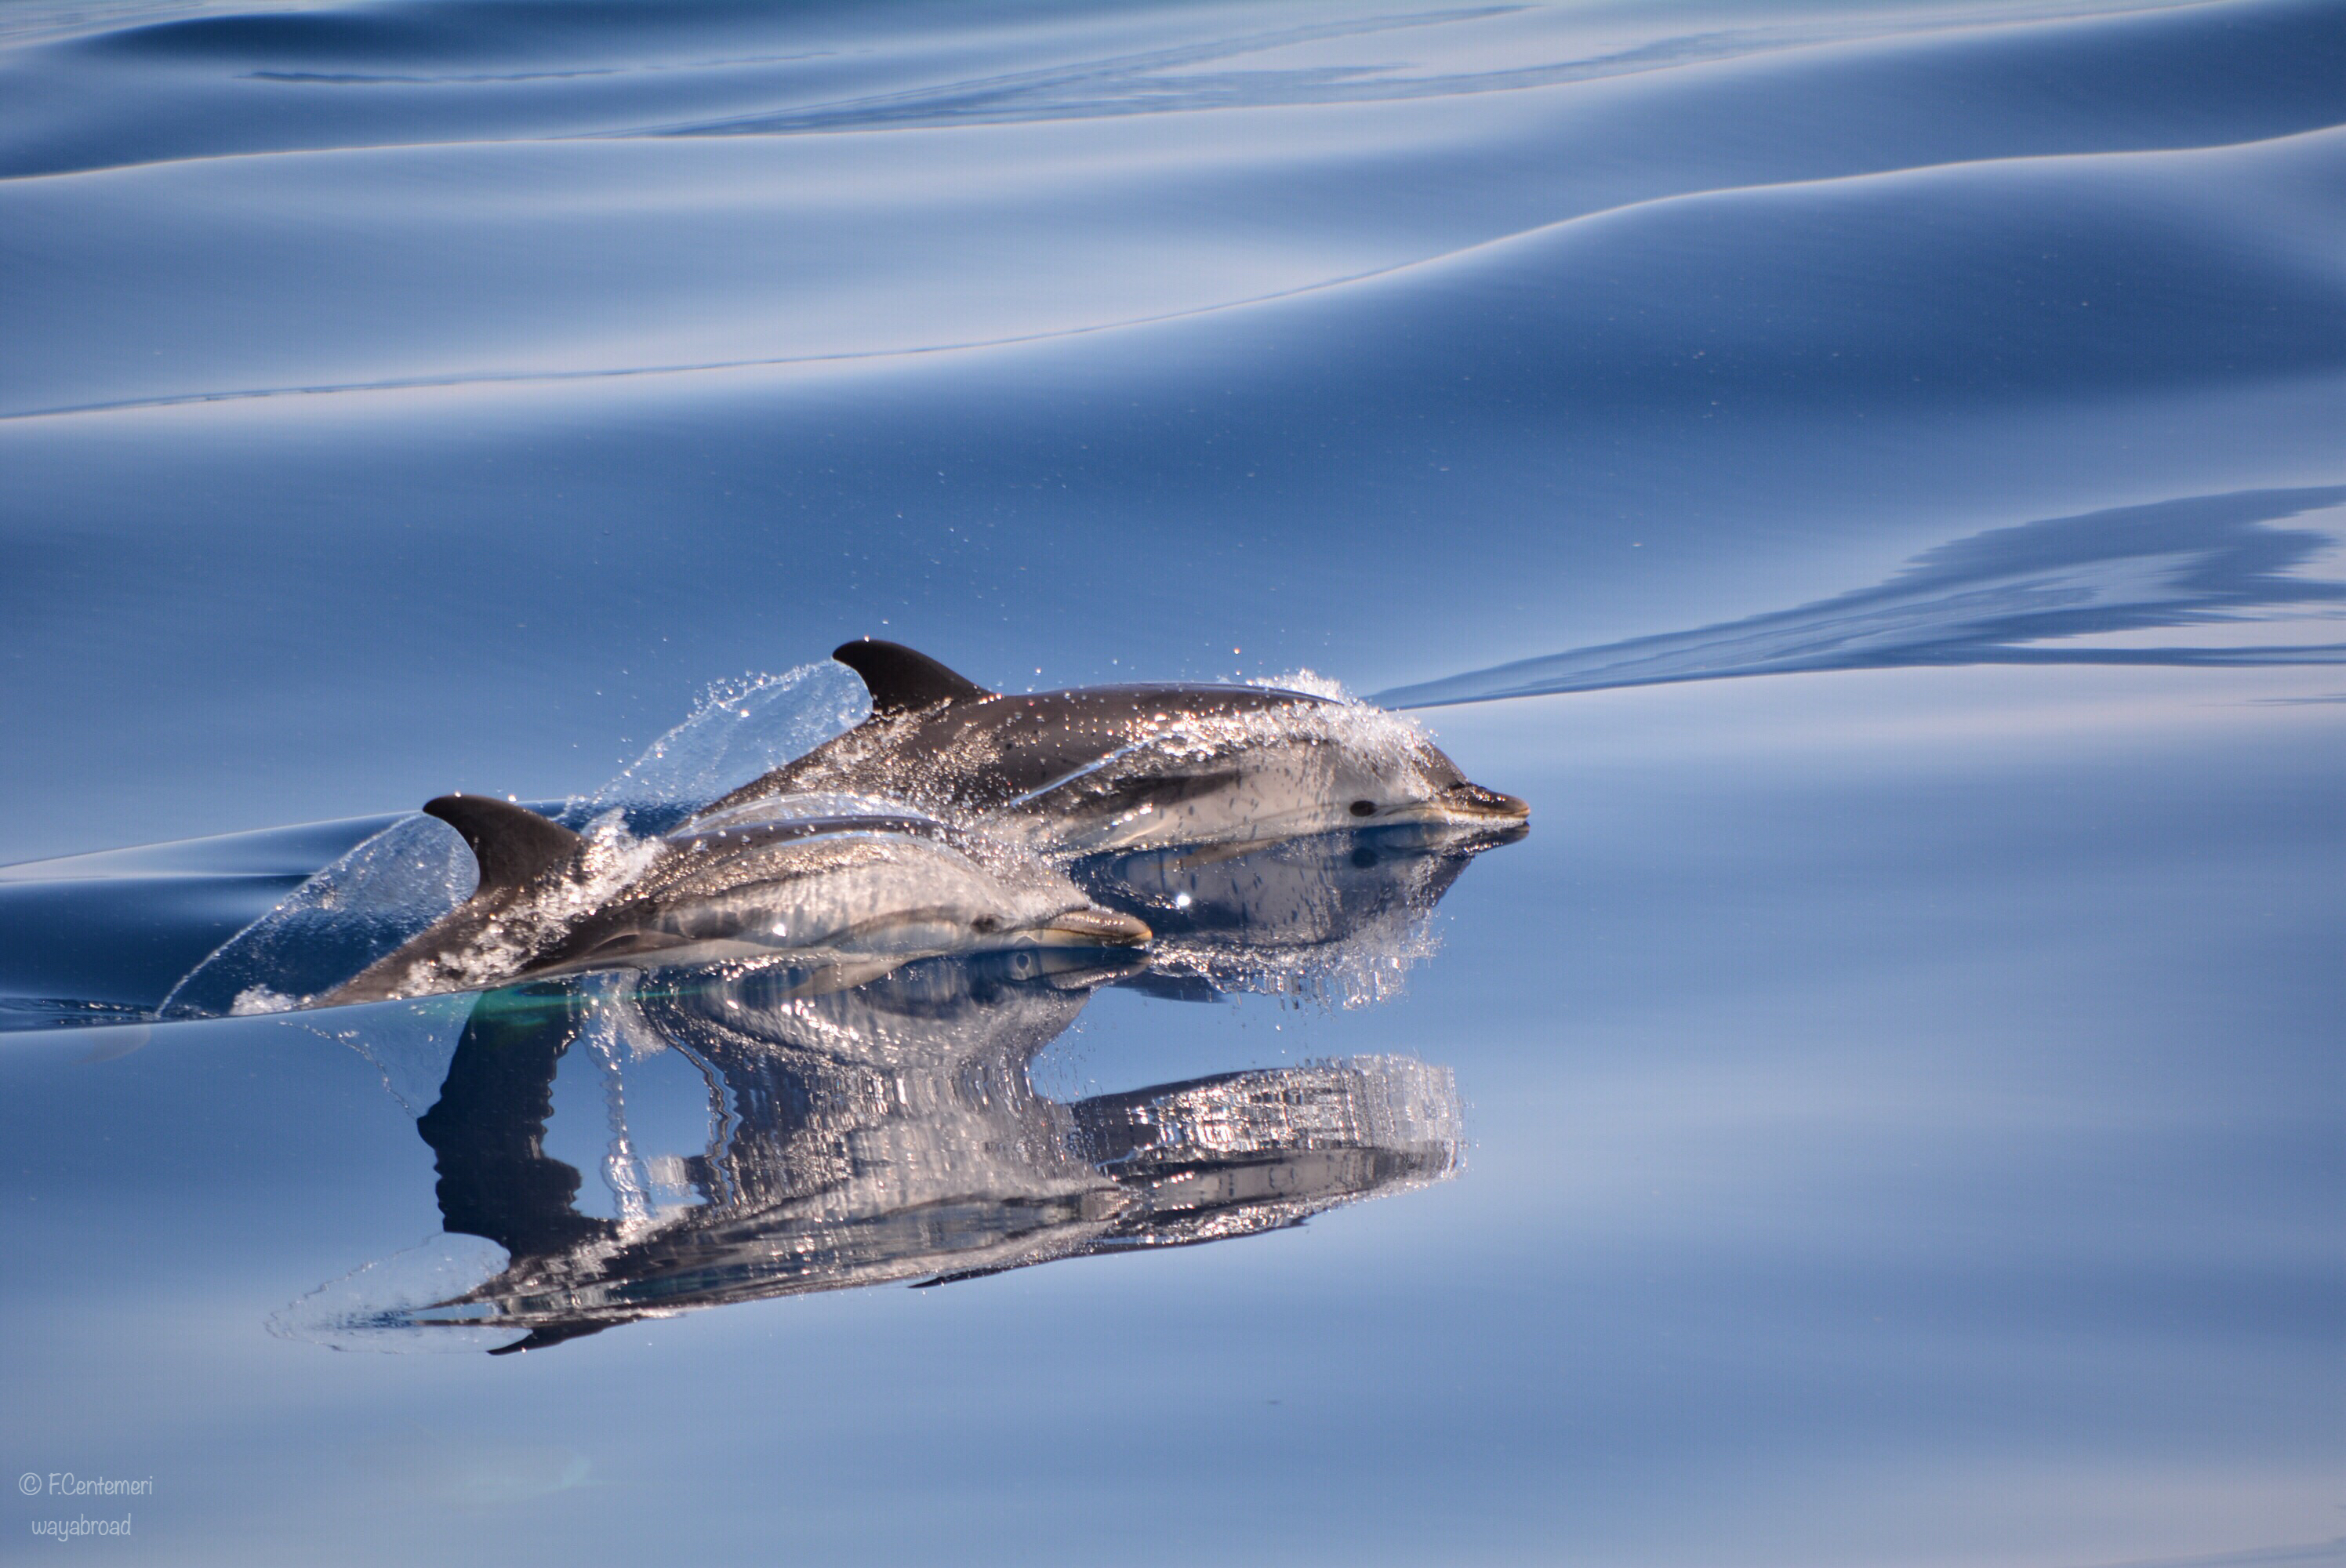 Whalewatch Genova: avvistamento cetacei al largo di Genova!